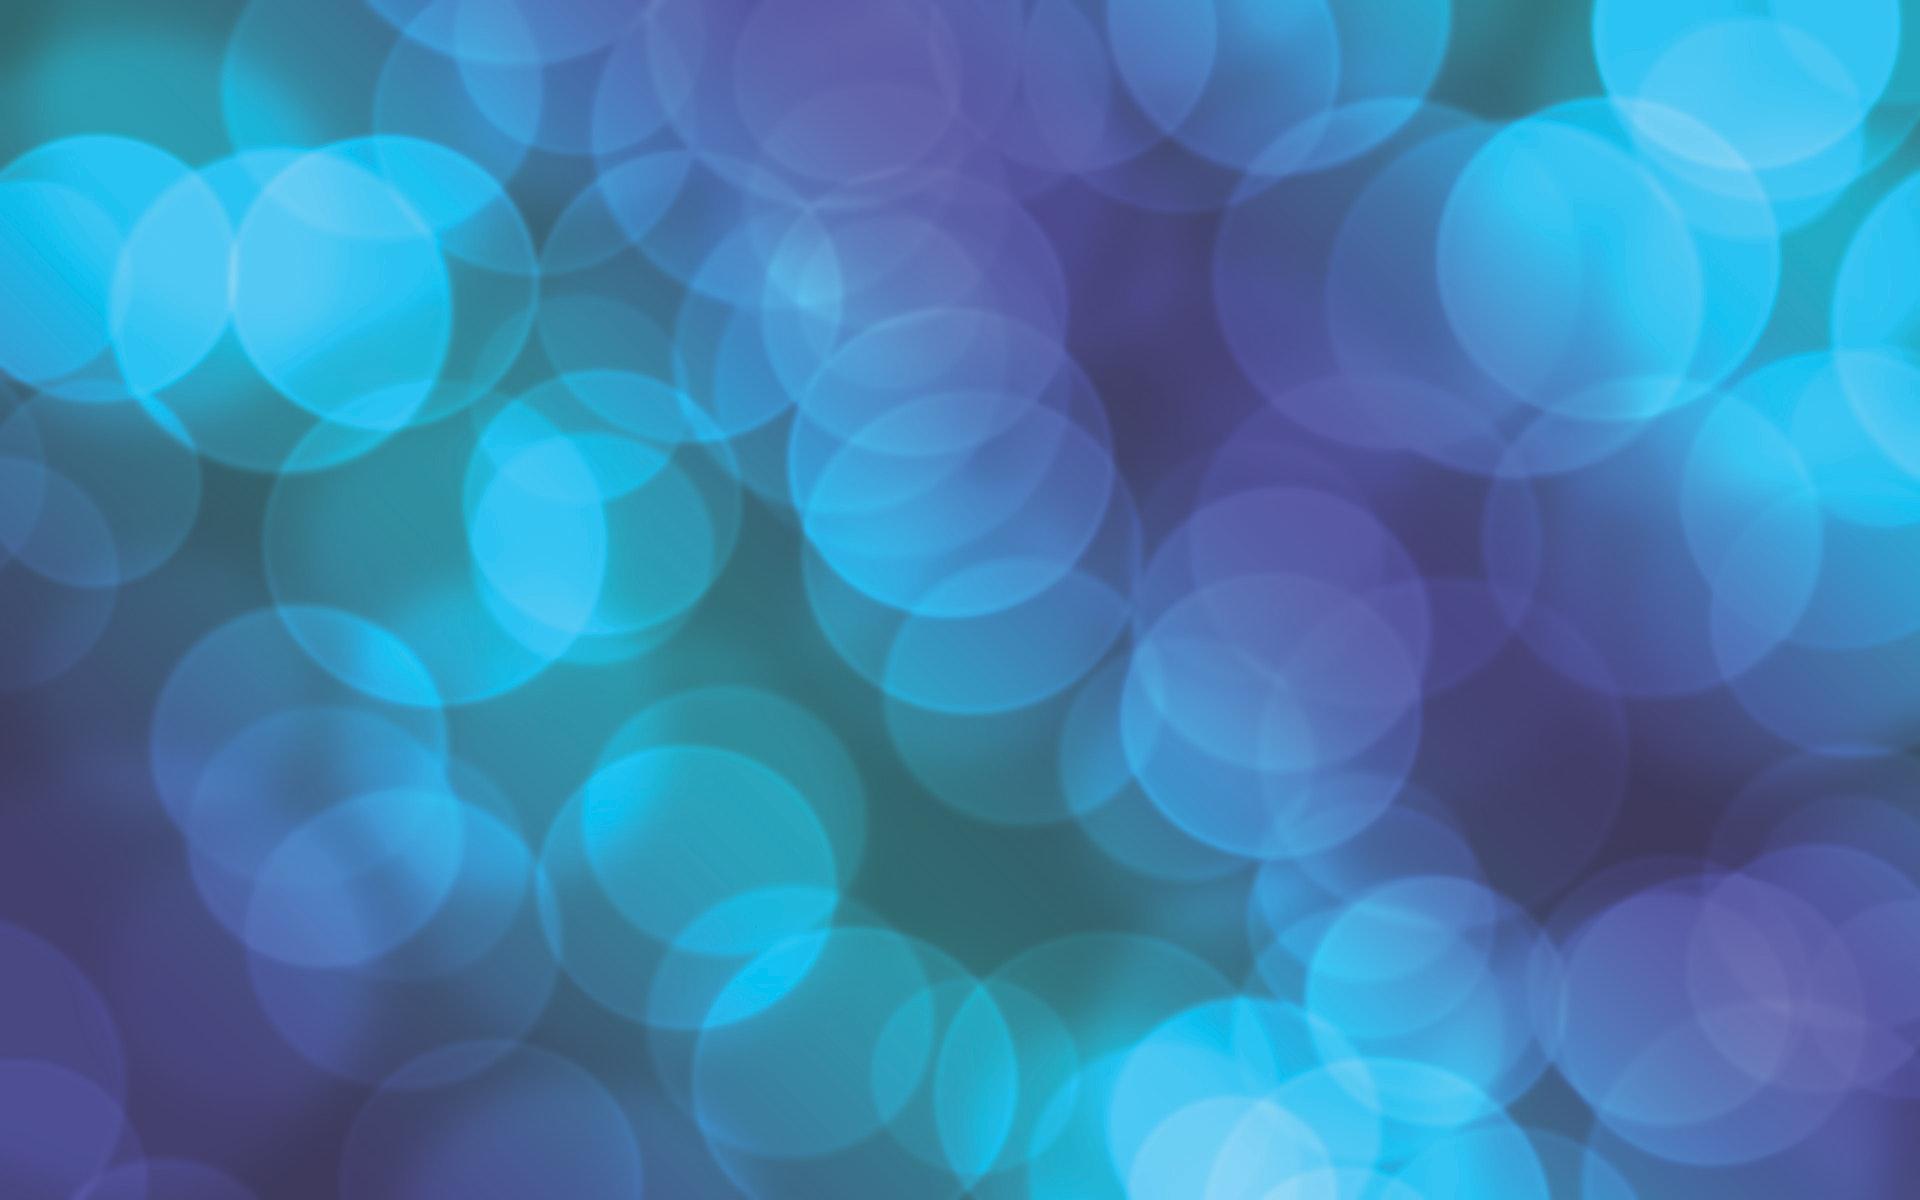 عکس زمینه روشنایی نور با حلقه های آبی پس زمینه